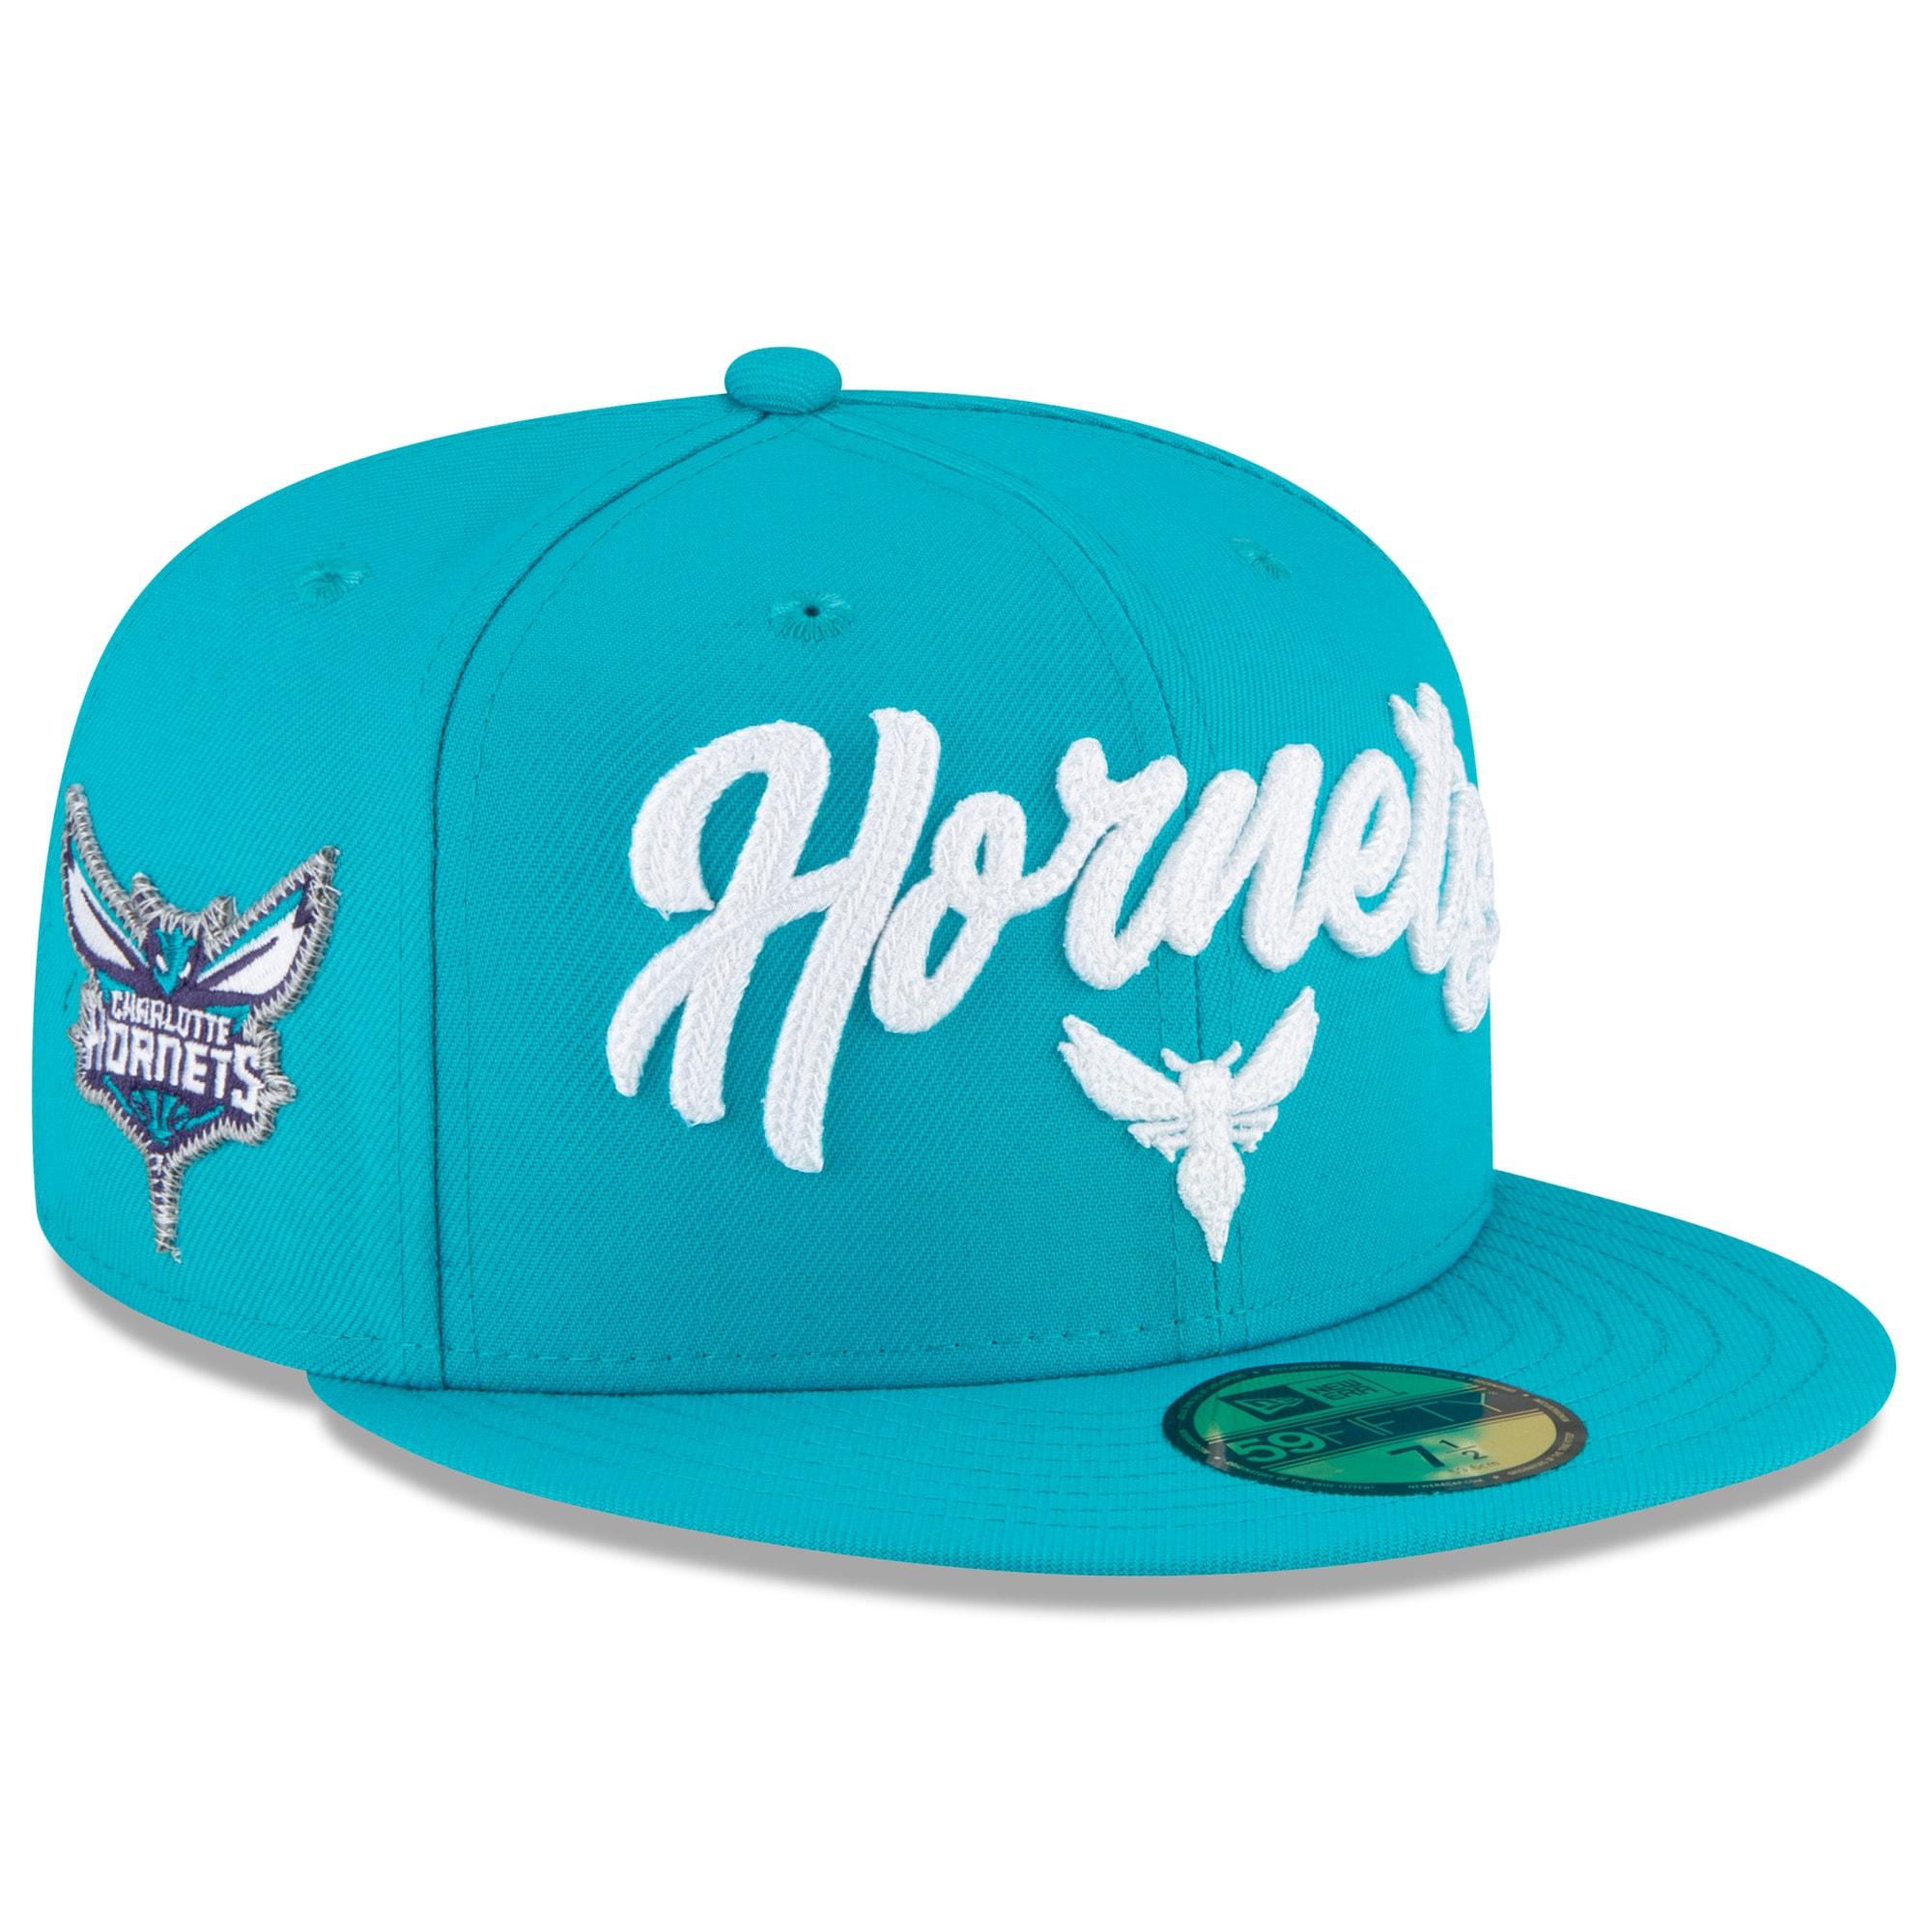 Charlotte Hornets New Era 2020 NBA Draft OTC 59FIFTY Fitted Hat - Teal